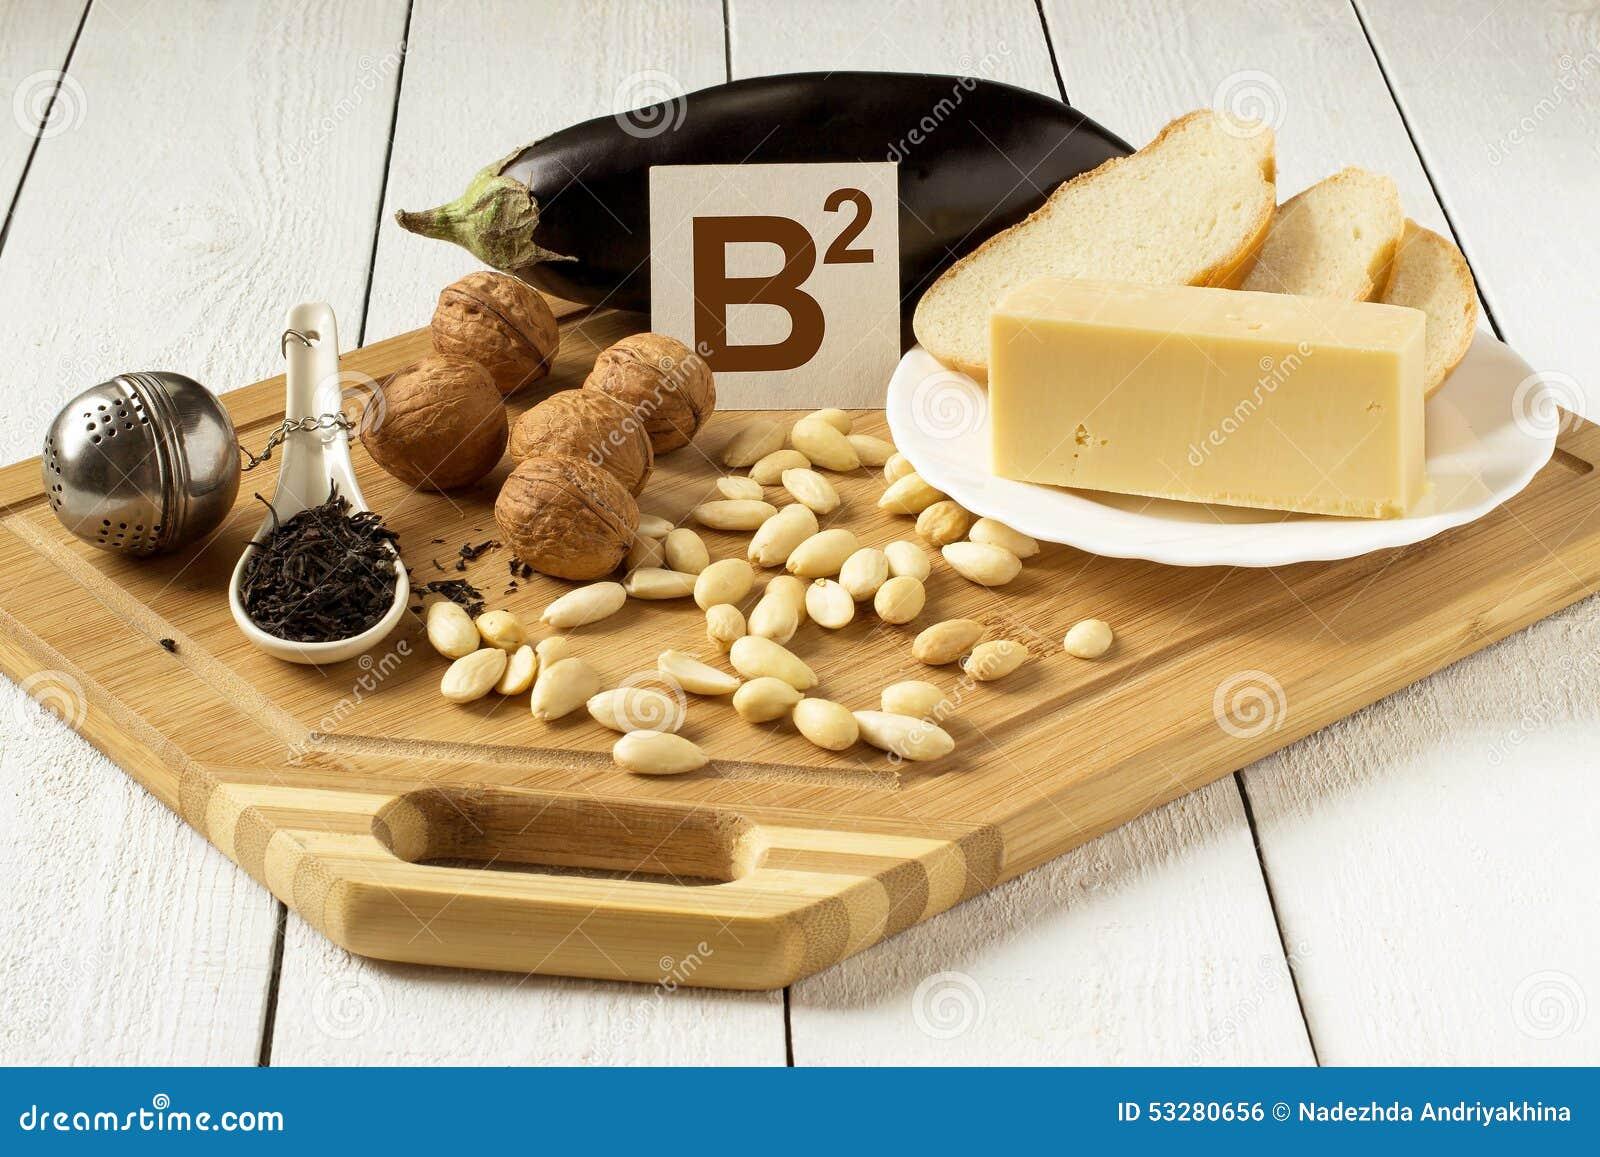 Alimenti ricchi in vitamina B2